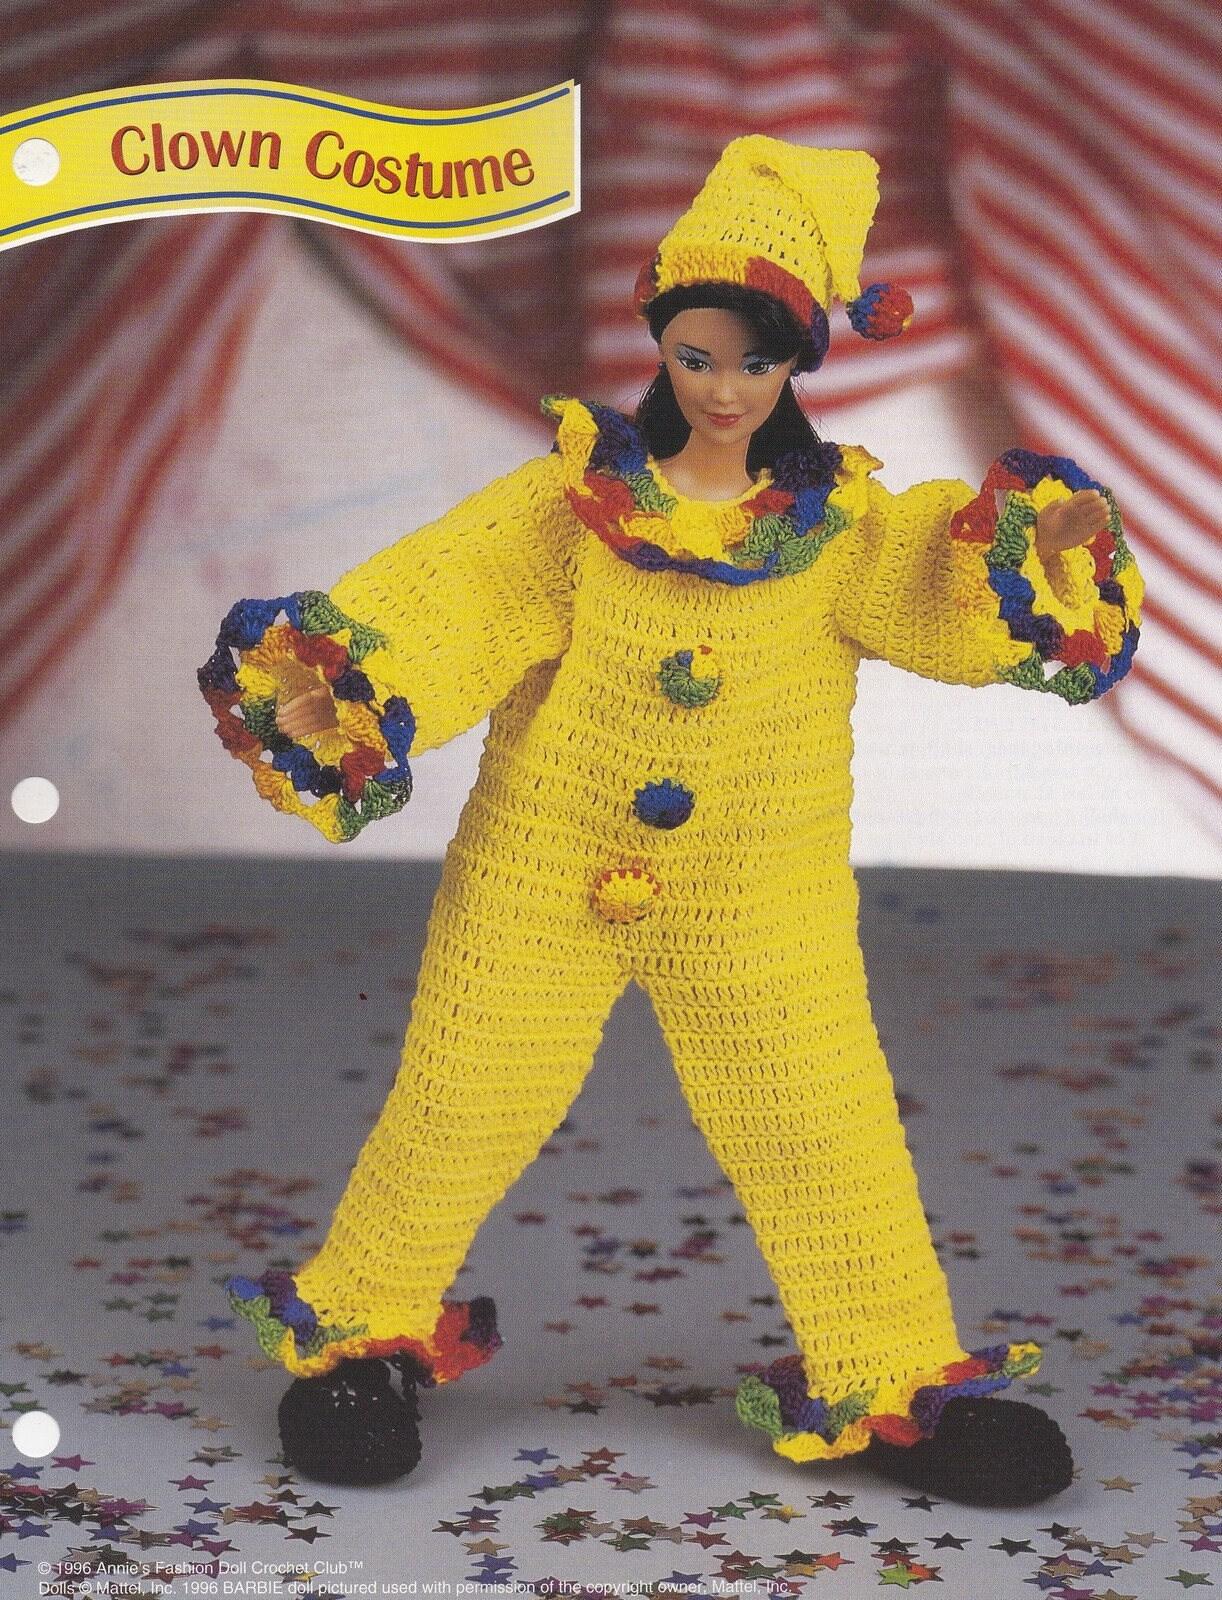 Clown-Kostüm Annie Attic Mode Puppe häkeln Muster Club